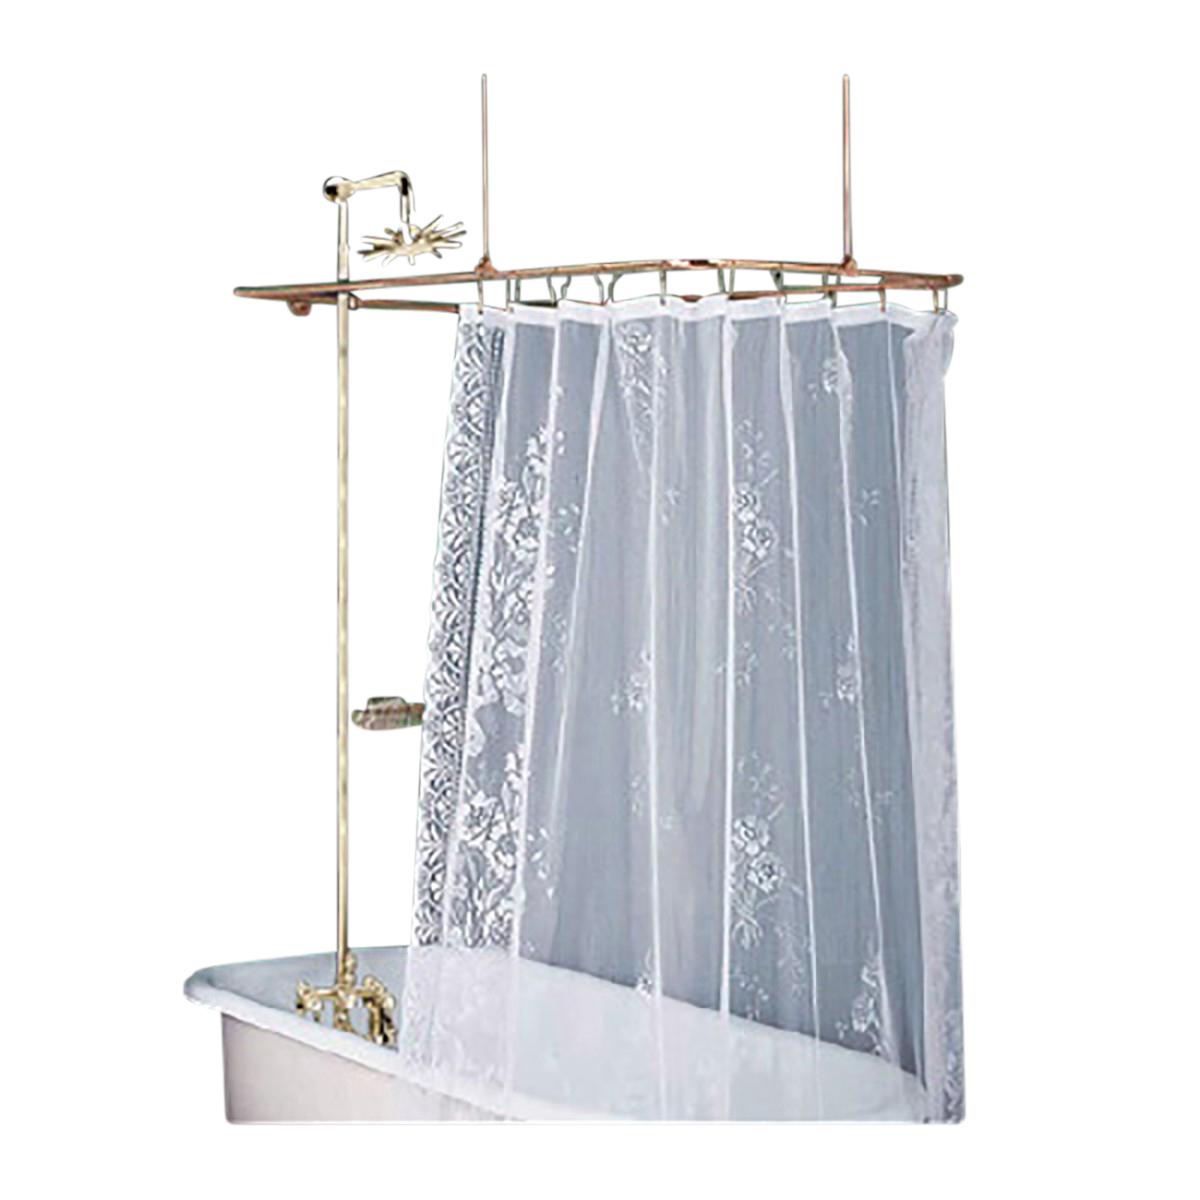 Rectangular Shower Surround Clawfoot Tub Wall Mount Faucet